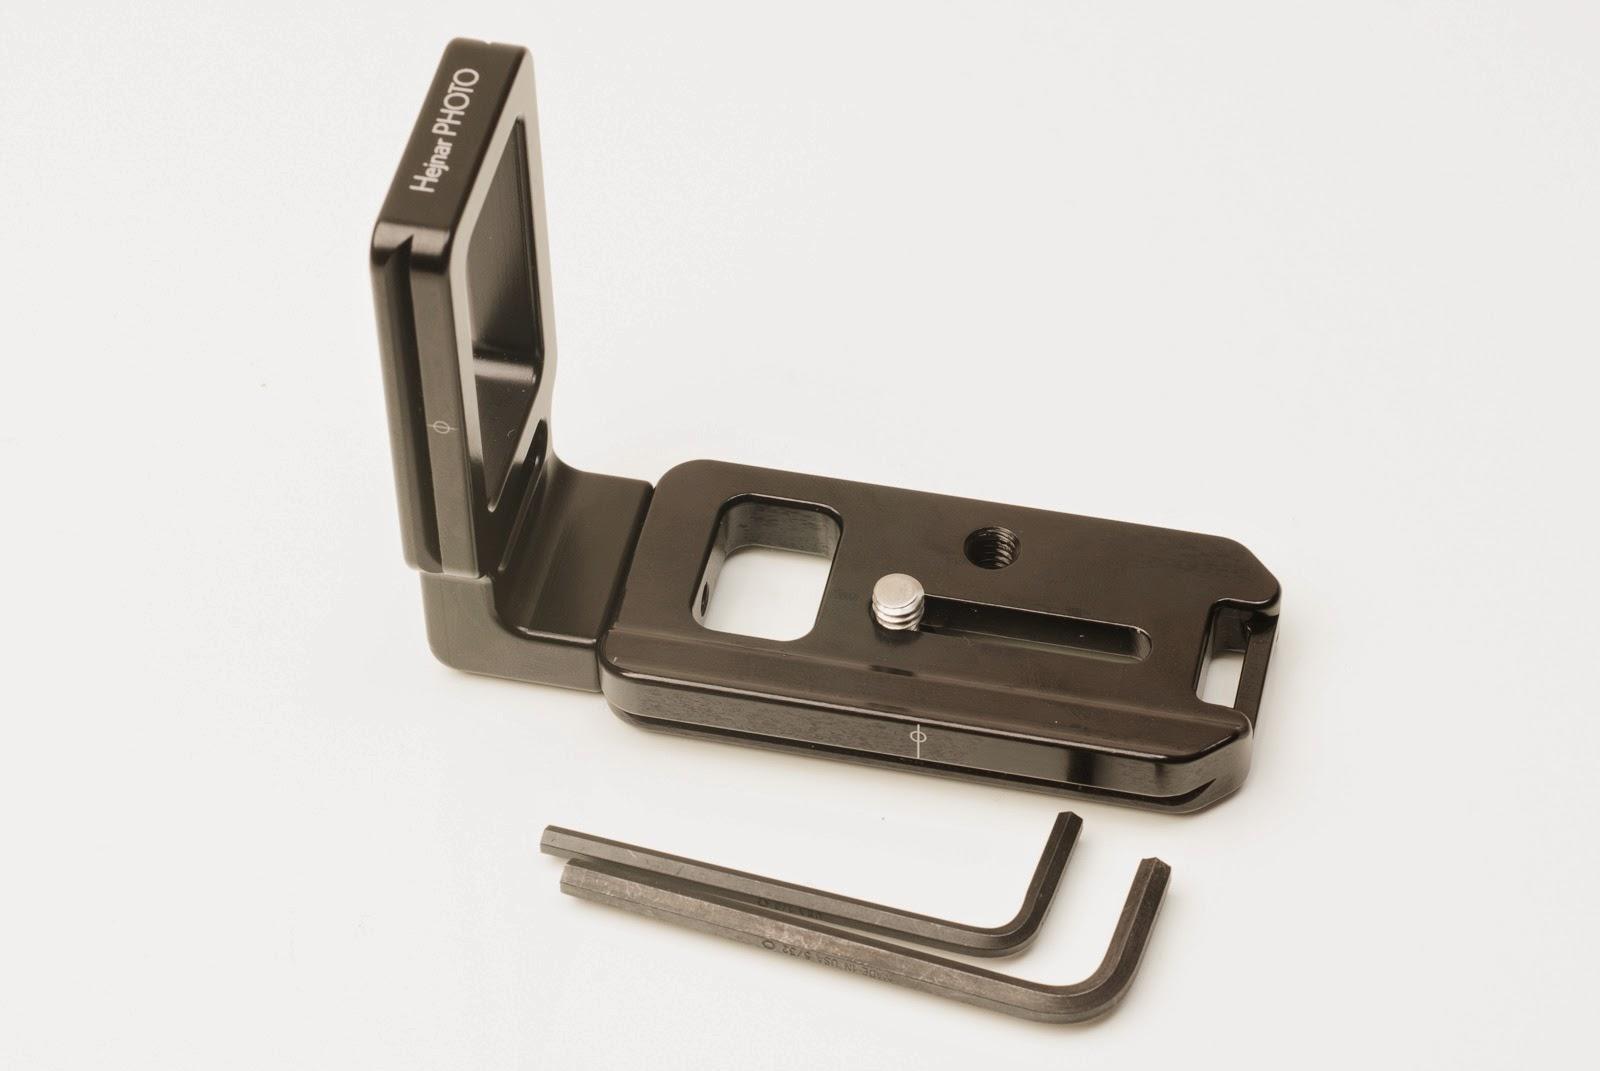 Hejnar PHOTO ND7100 Dedicated L bracket + tools